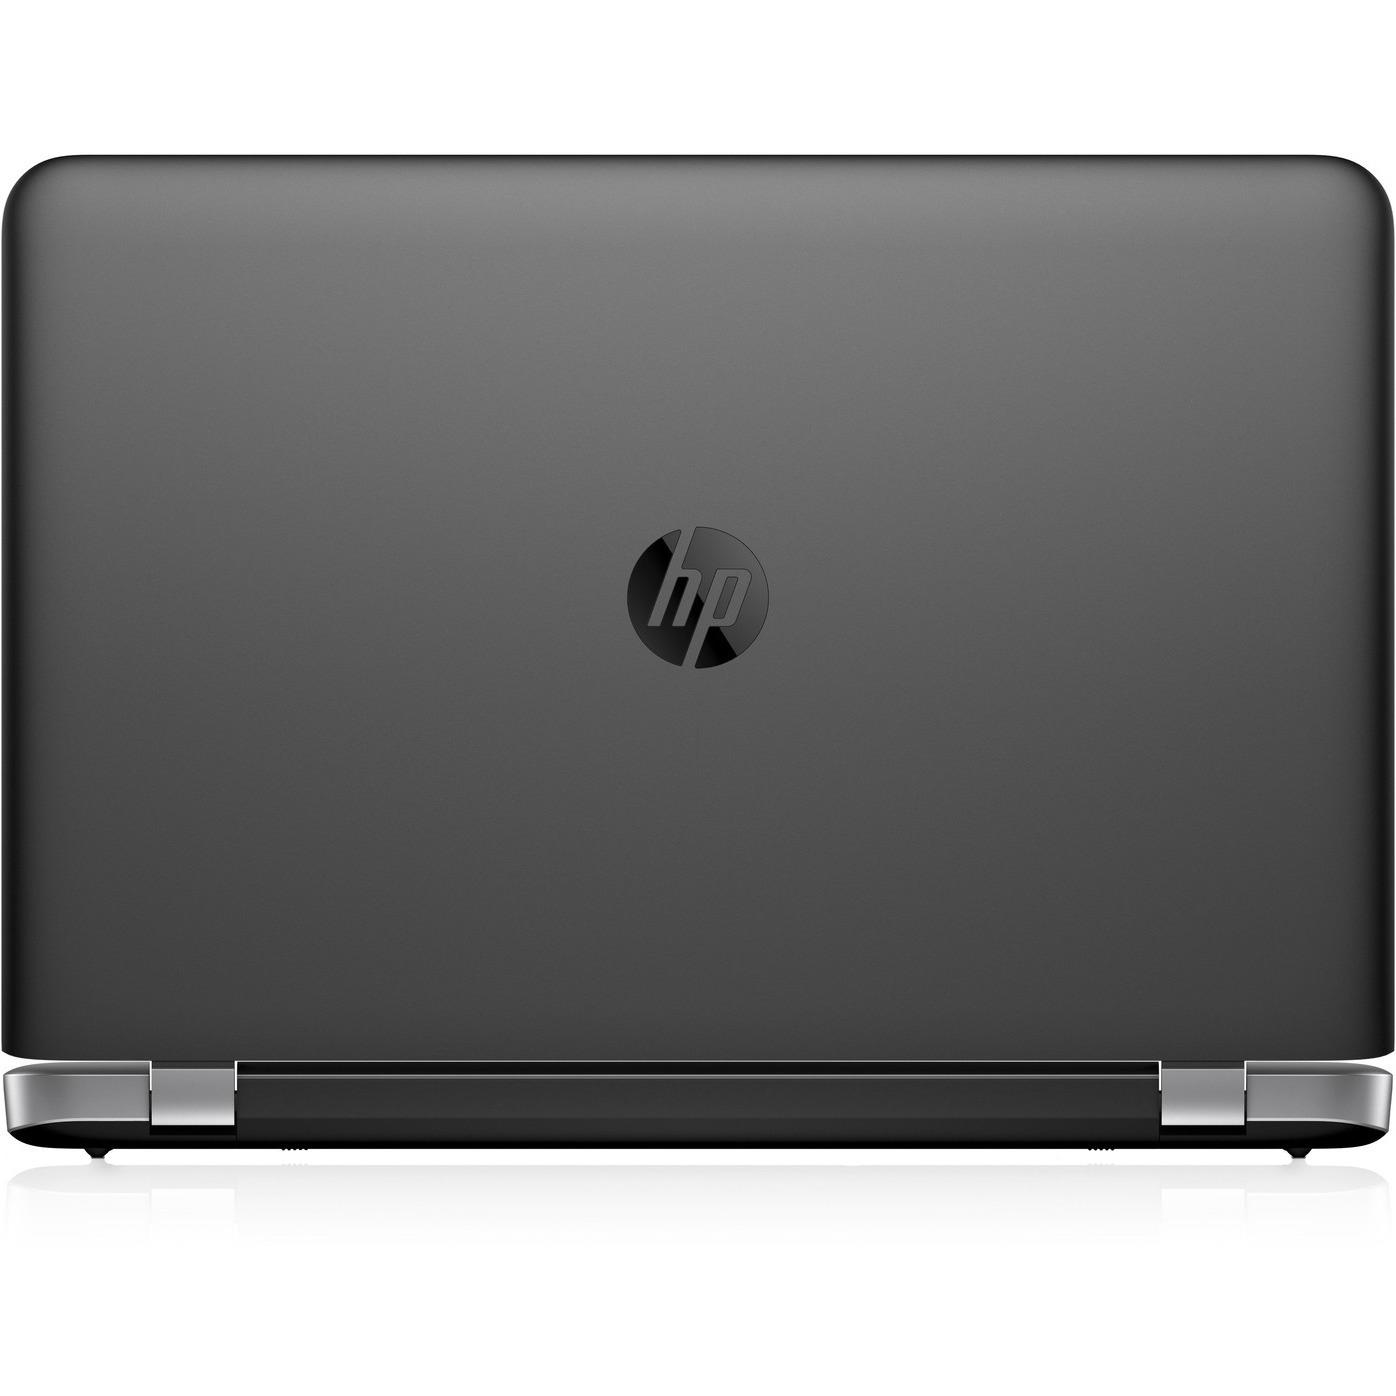 HP ProBook 470 G3 43.9 cm 17.3inch Notebook - Intel Core i5 i5-6200U Dual-core 2 Core 2.30 GHz - 4 GB DDR3L SDRAM RAM - 1 TB HDD - DVD-Writer - AMD Radeon R7 M340 D